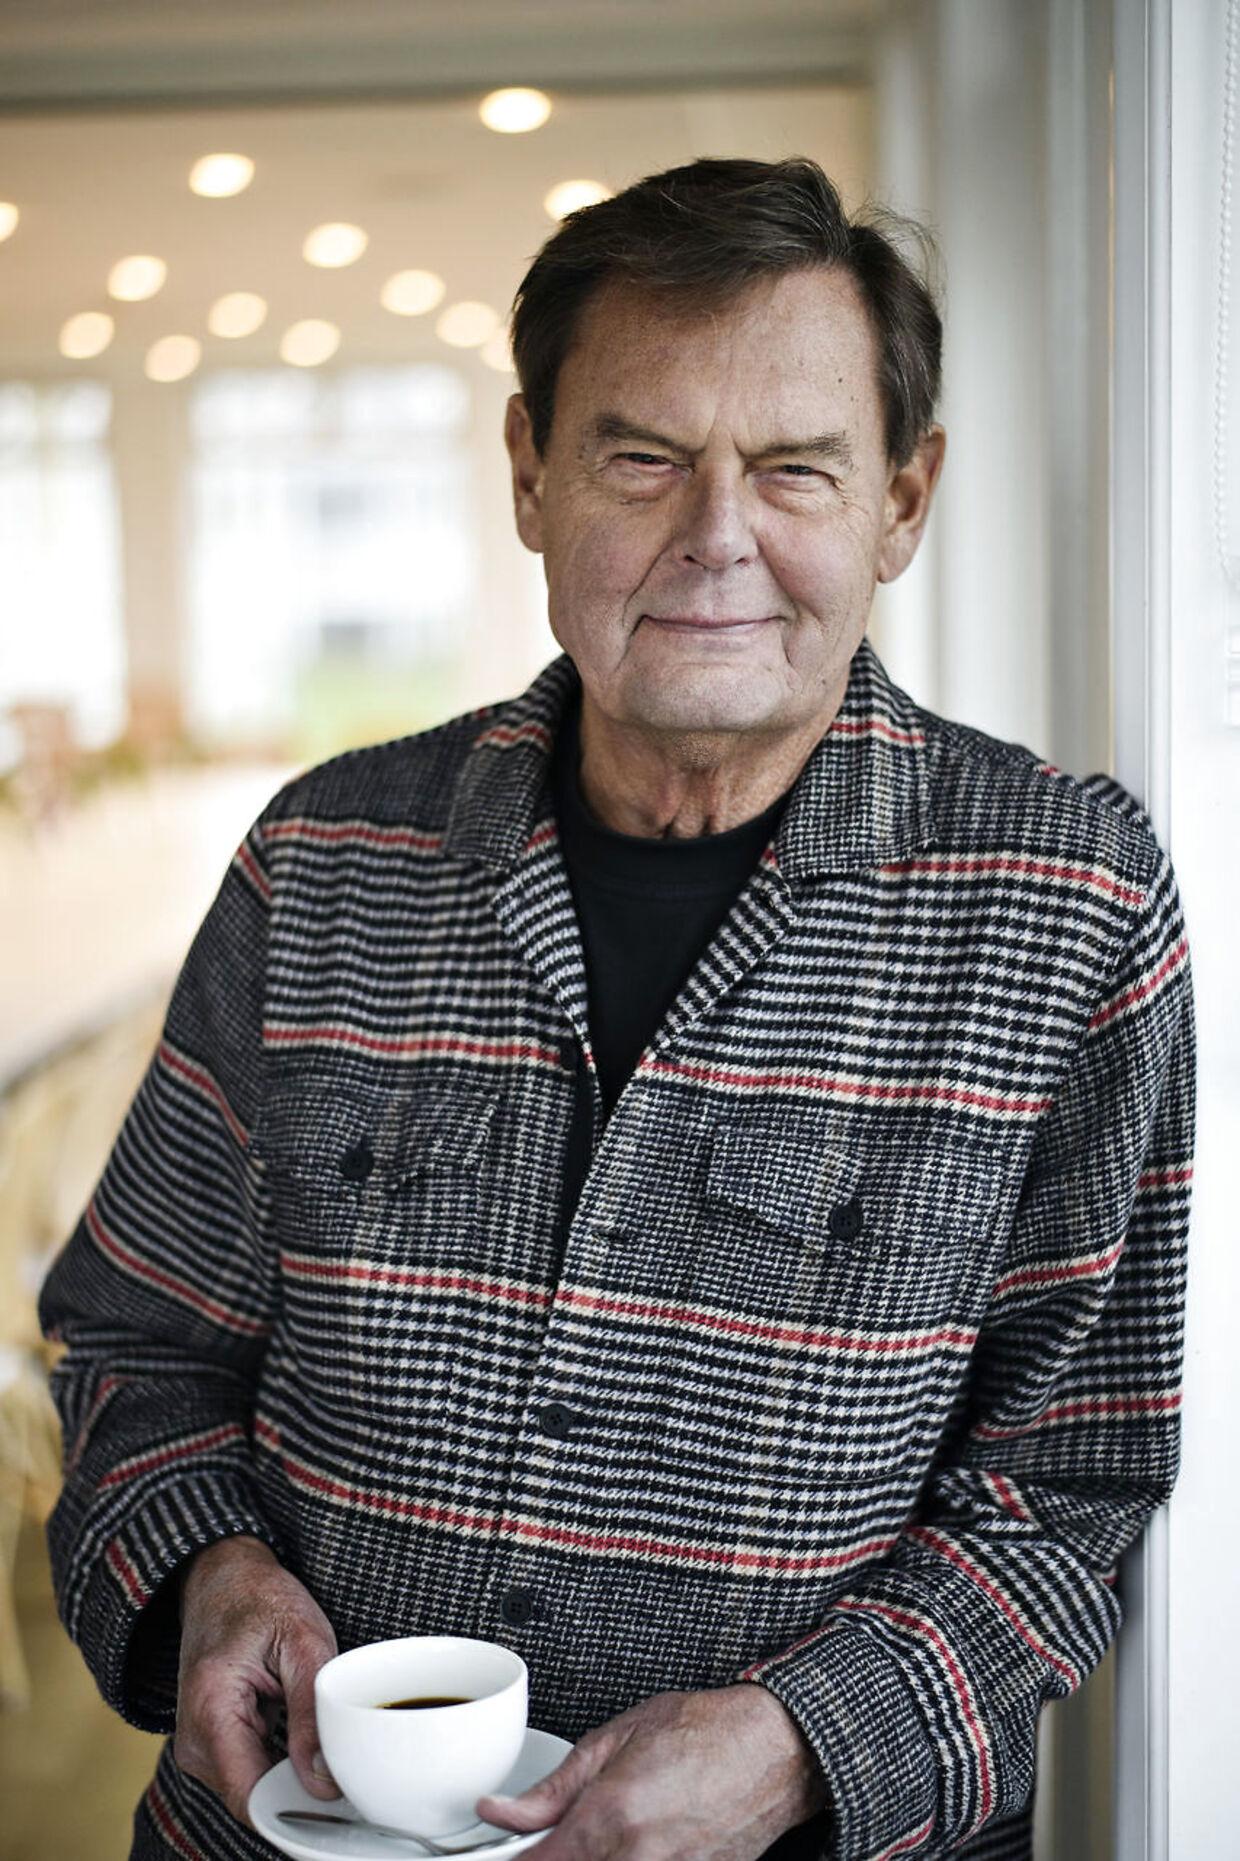 Skuespiller Ulf Pilgaard, da holdet bag Cirkusrevyen 2019 møder pressen i Klithuset i Dronningmølle søndag den 13. januar 2019.. (Foto: Philip Davali/Ritzau Scanpix)